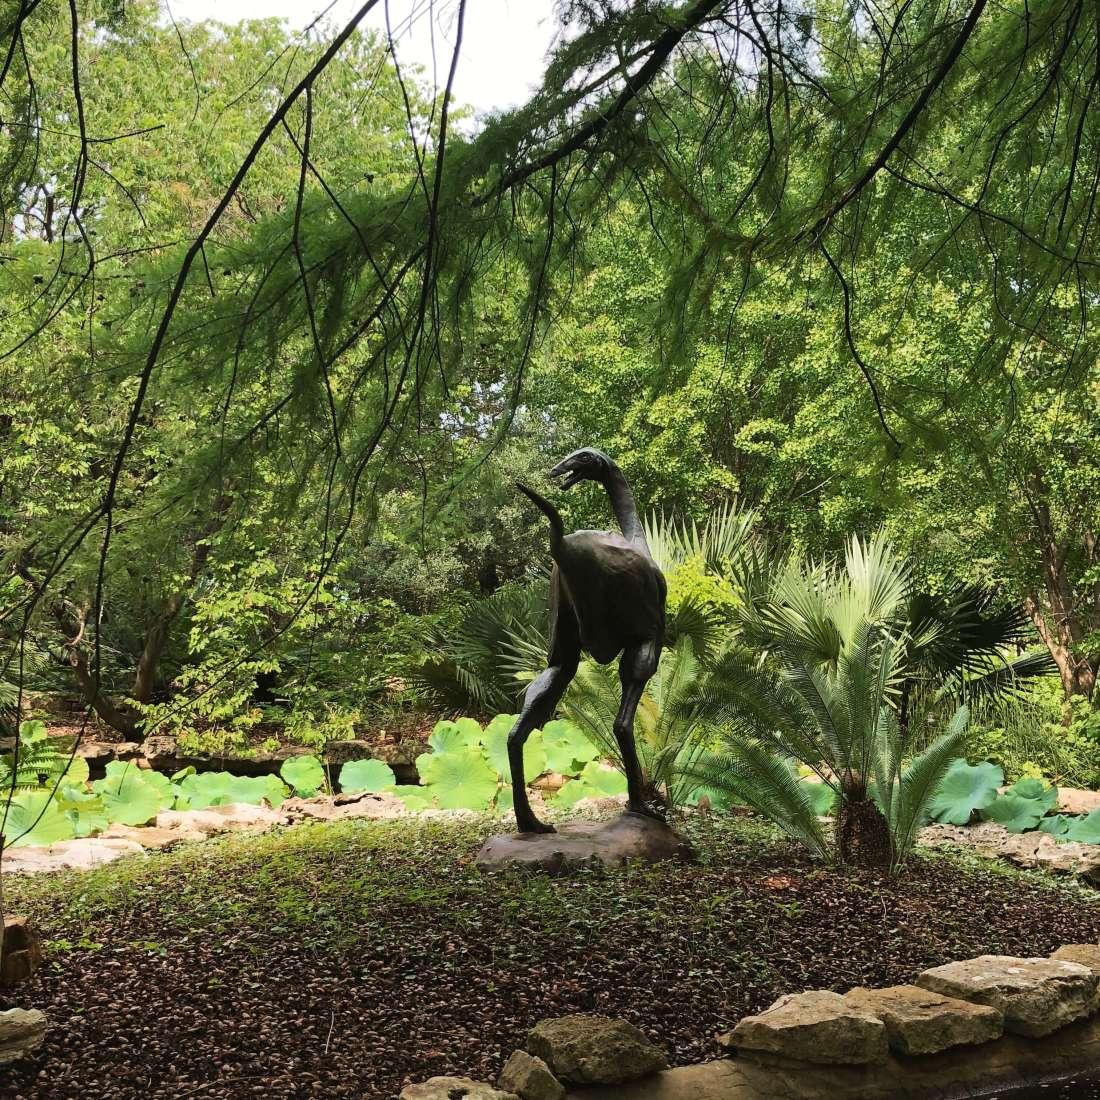 Dinosaur statue at the Zilker Botanical Garden in Austin, Texas